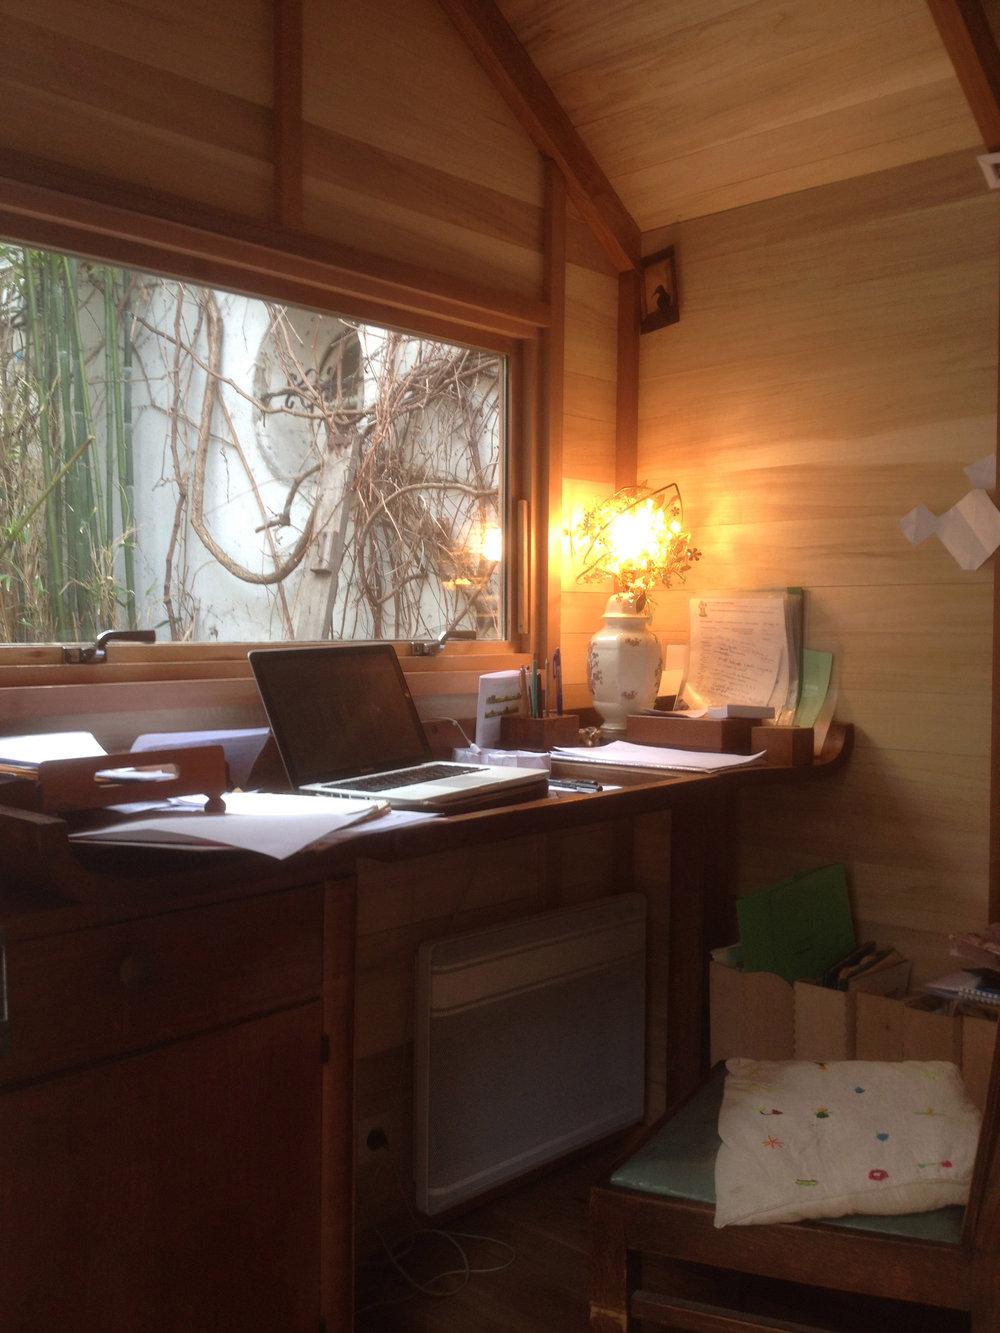 01-5-bureau-histoires-de-cabanes (3).jpg